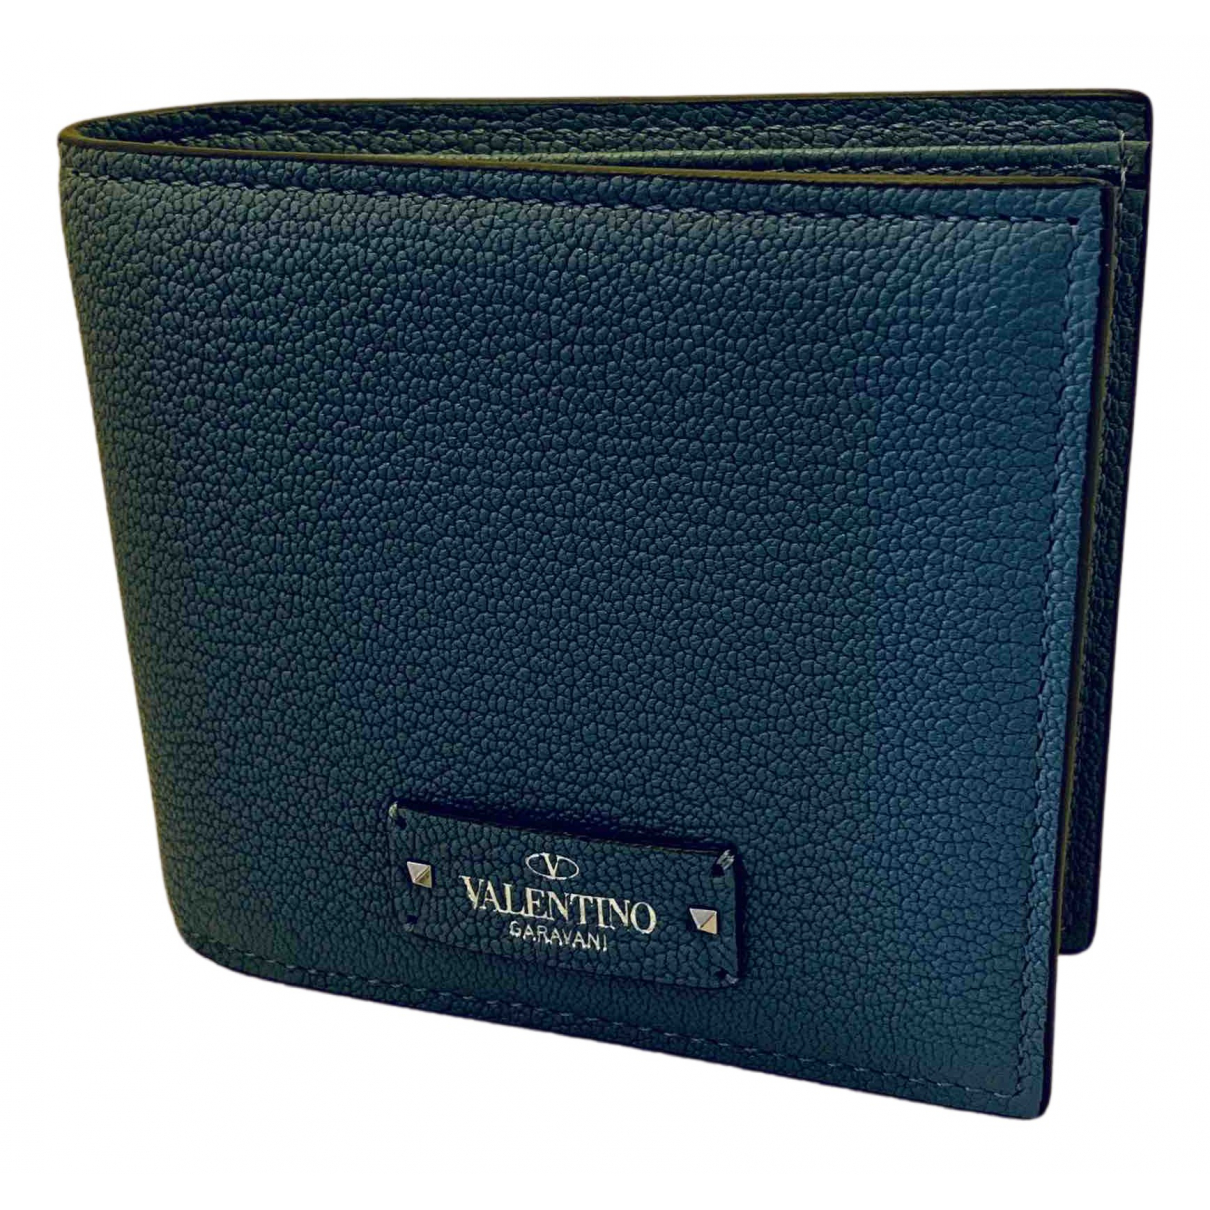 Valentino Garavani \N Kleinlederwaren in  Blau Leder